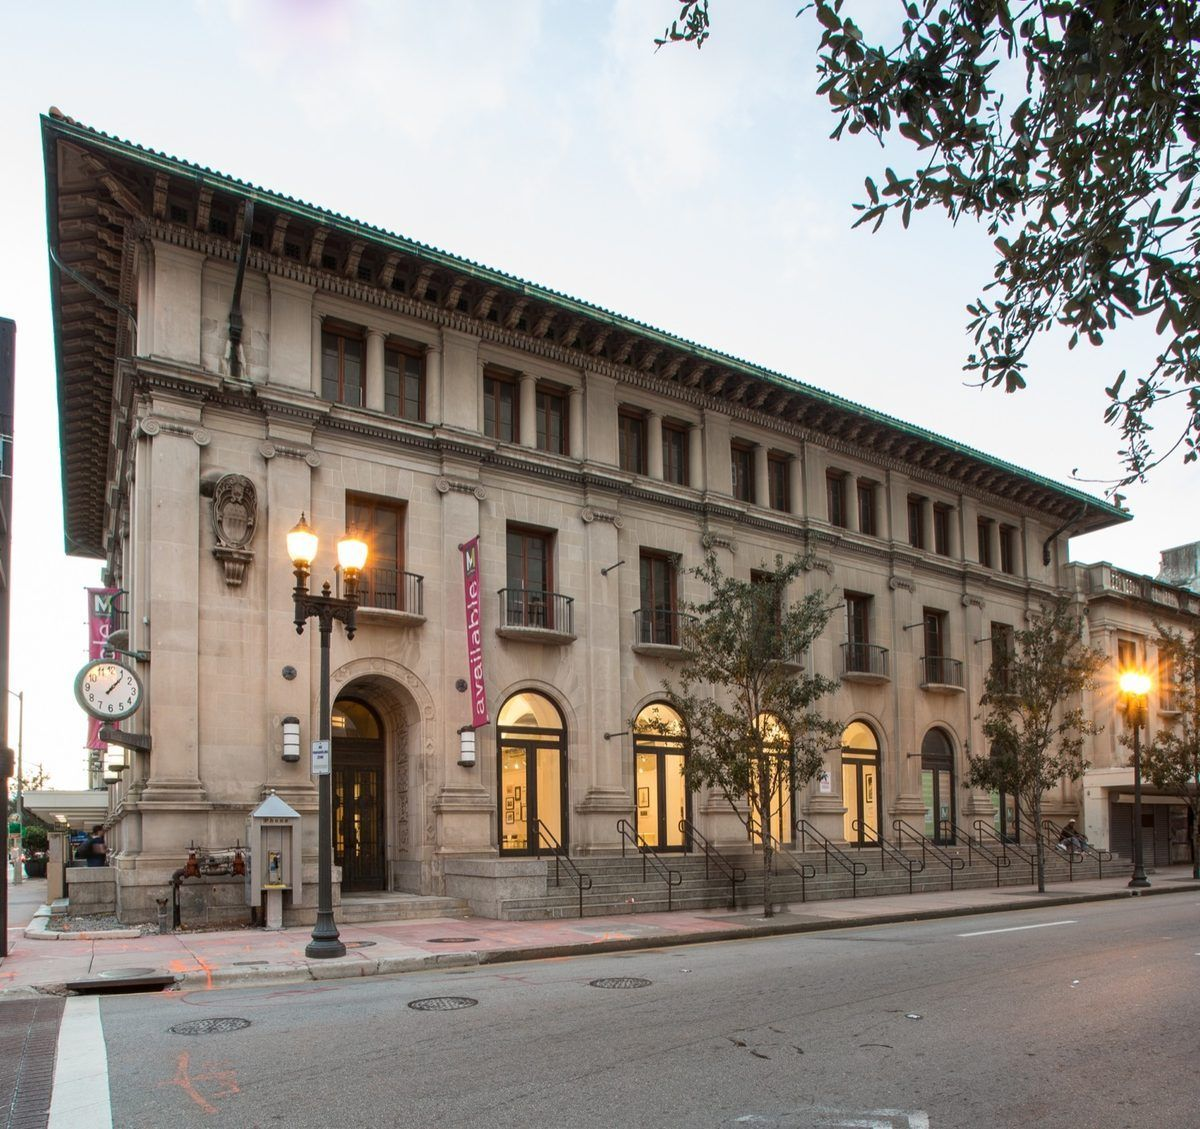 Exploring The New Miami Center For Architecture And Design